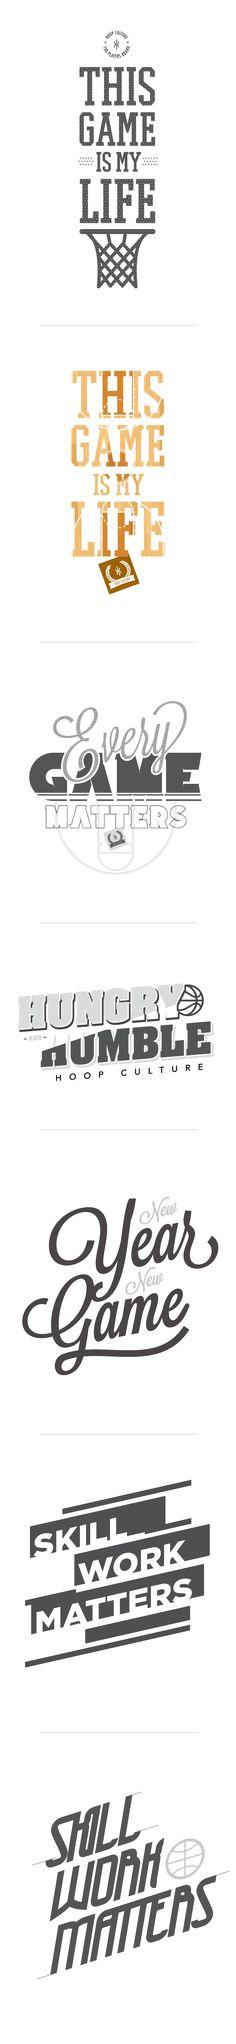 Basketball T-Shirt Designs by Jim Vranas, via Behance